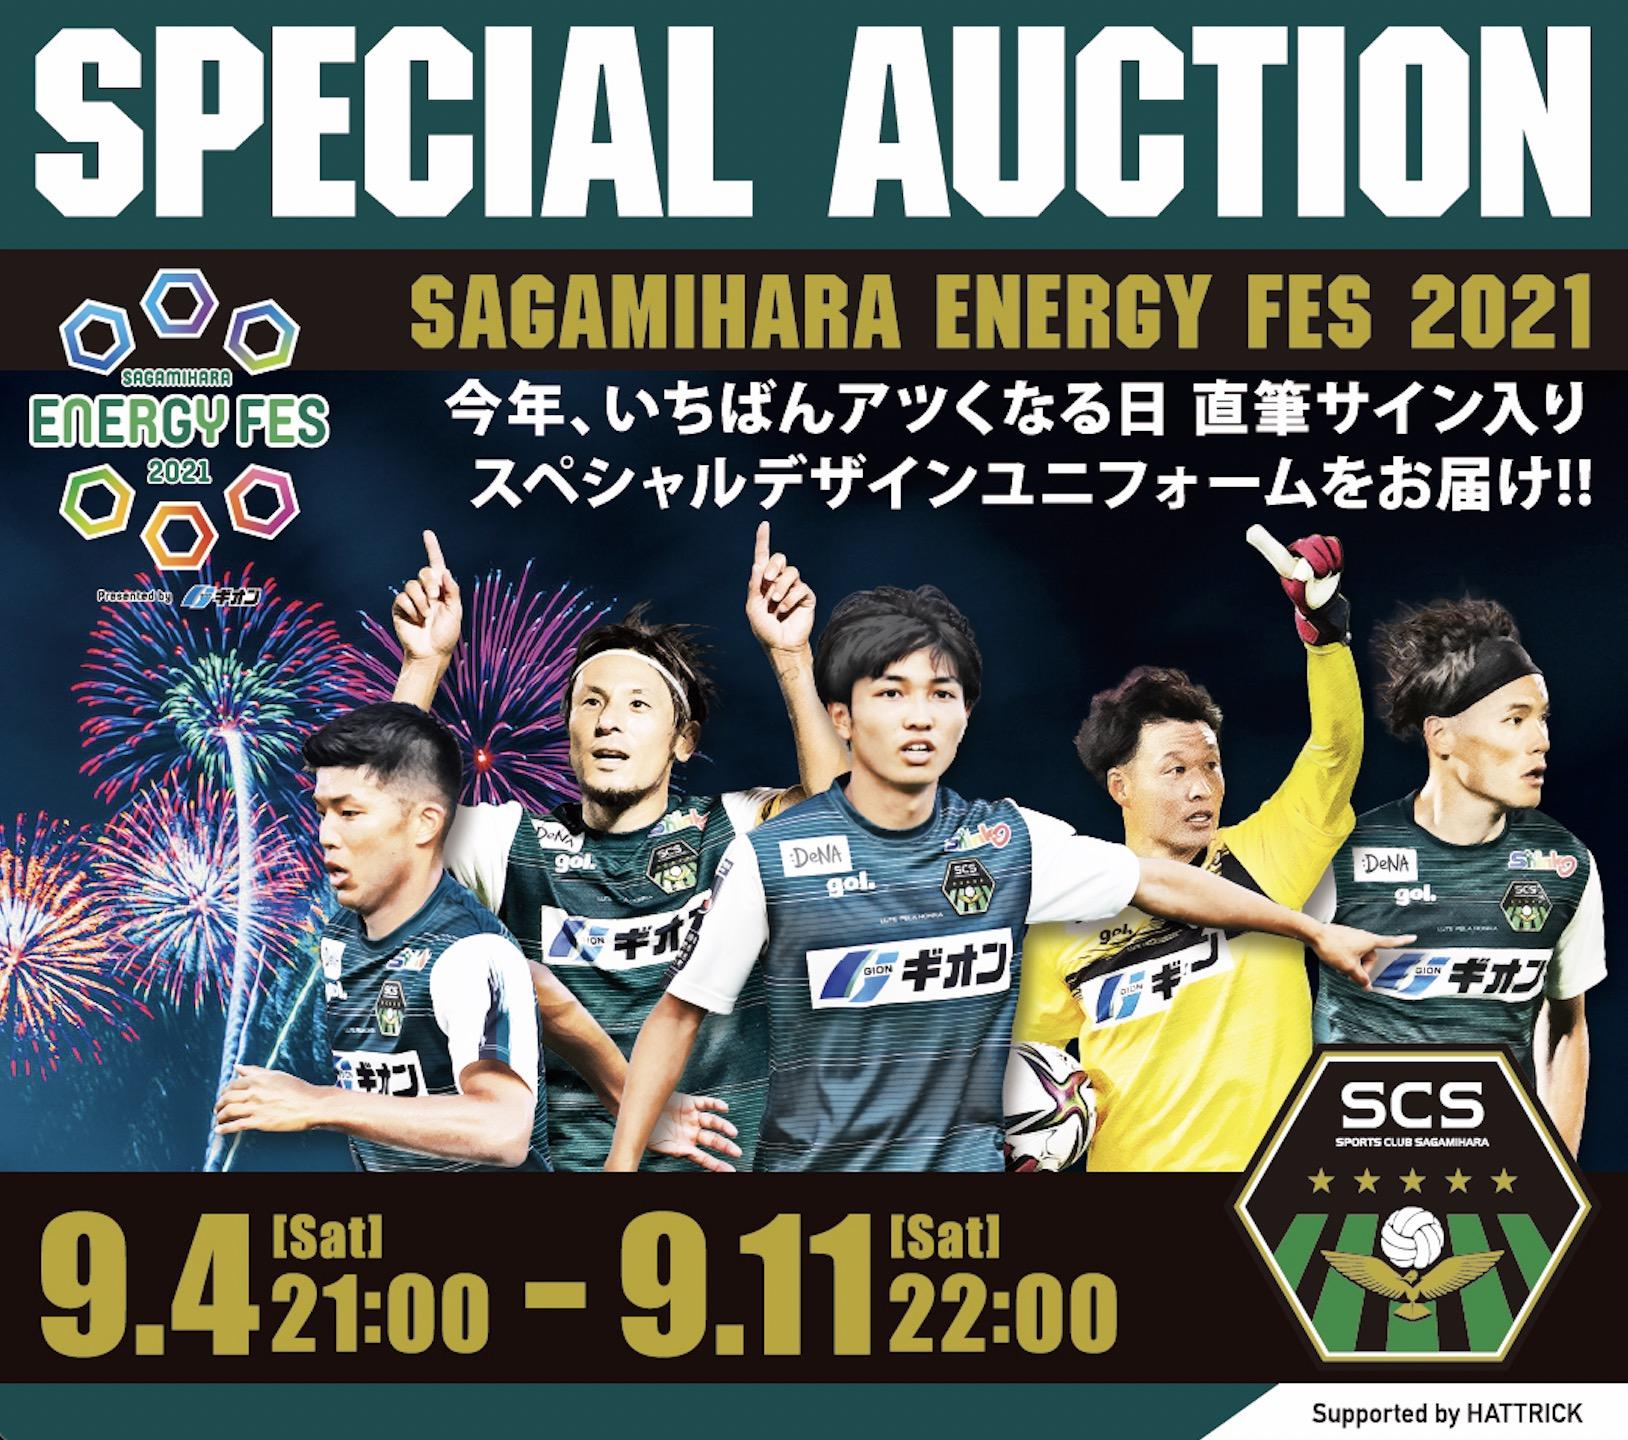 SC相模原 SAGAMIHARA ENERGY FES2021 Presented by ギオン スペシャルオークション